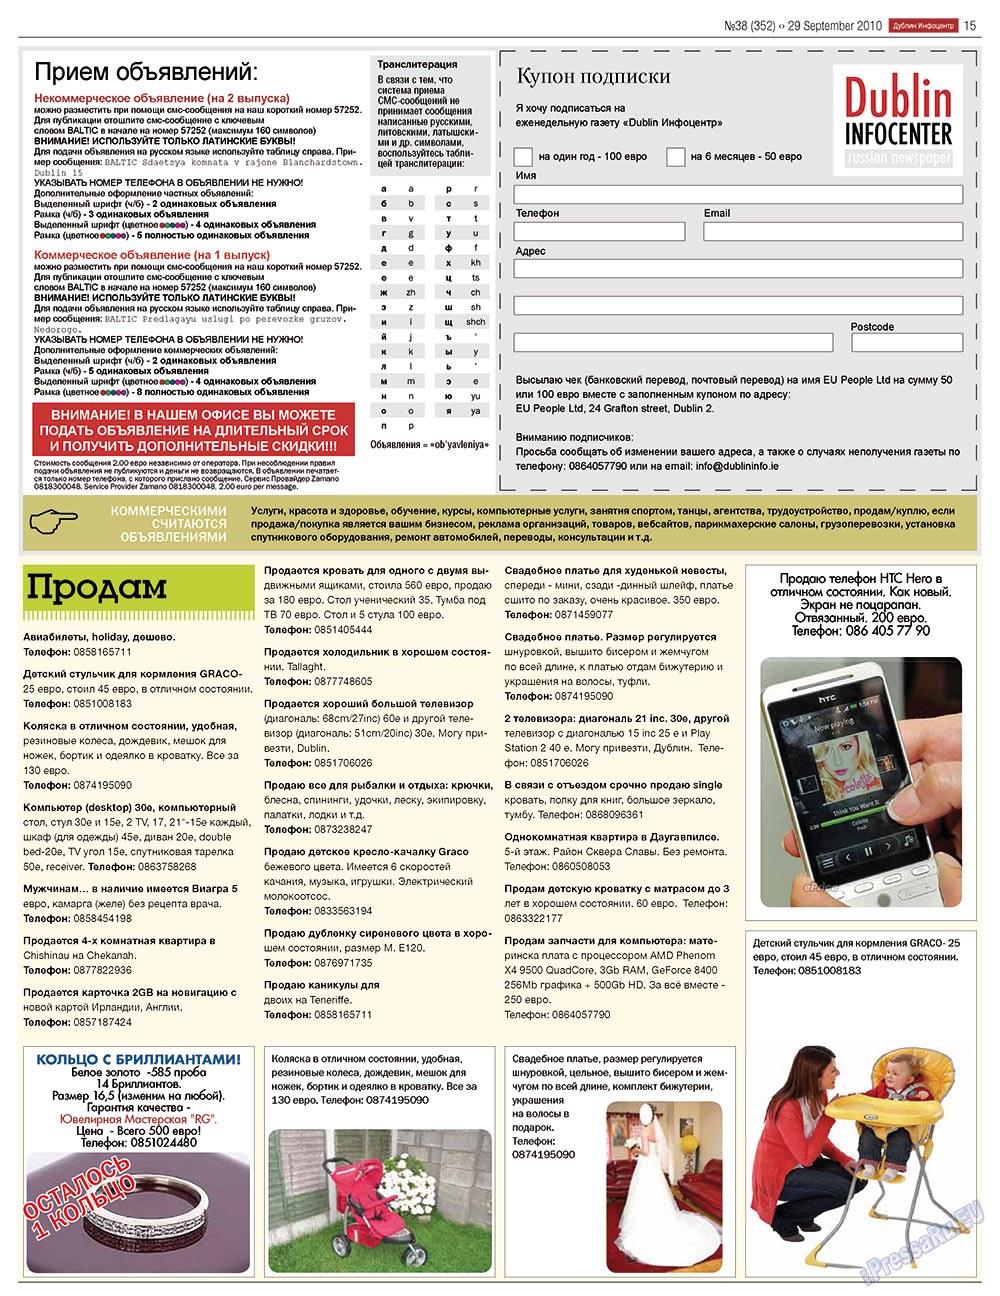 Дублин инфоцентр (газета). 2010 год, номер 38, стр. 15